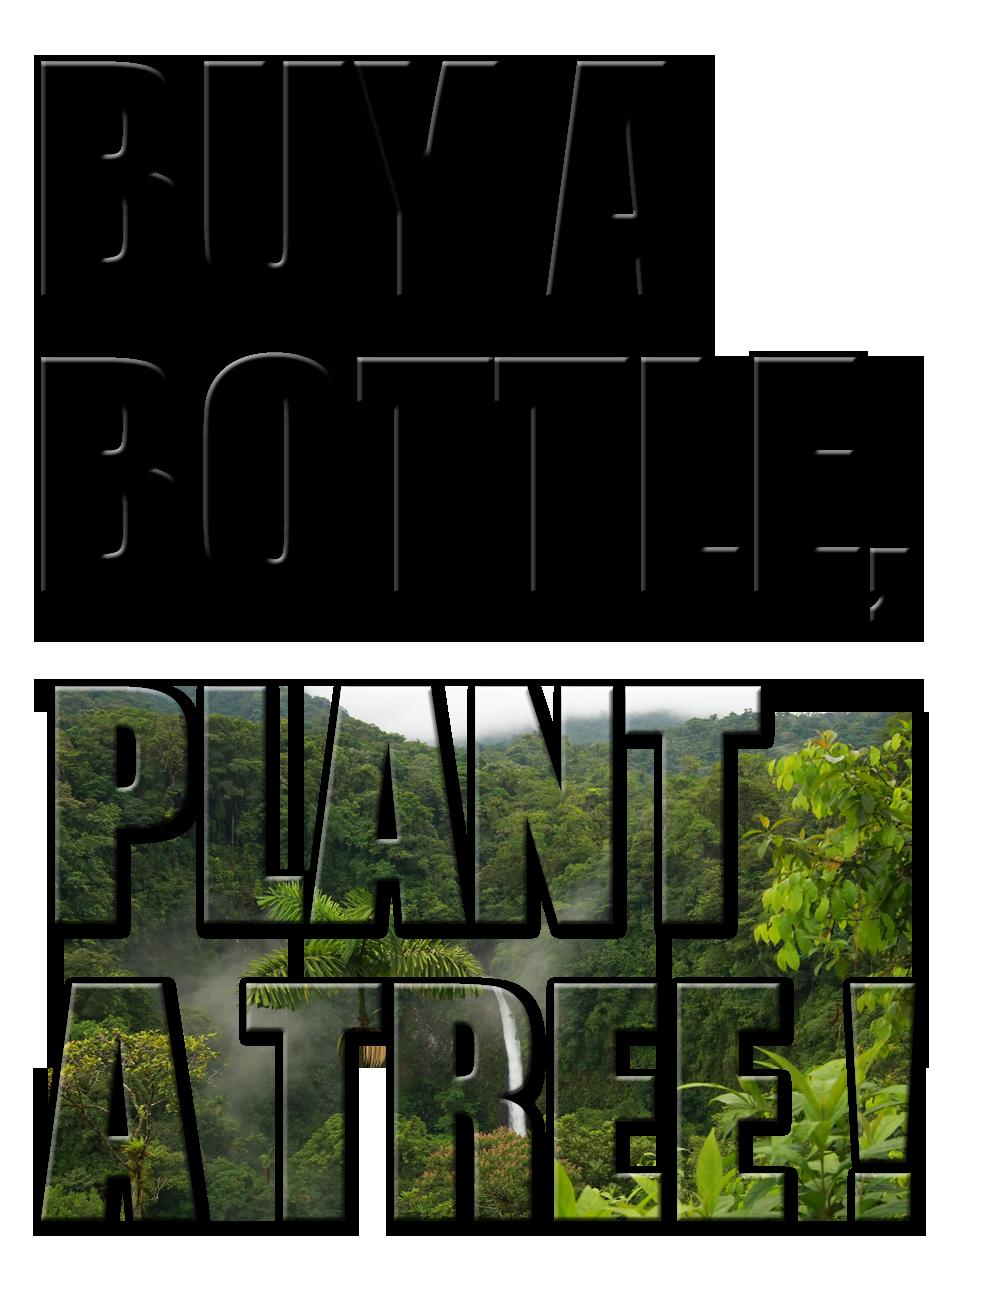 BUY A BOTTLE PLANT A TREE